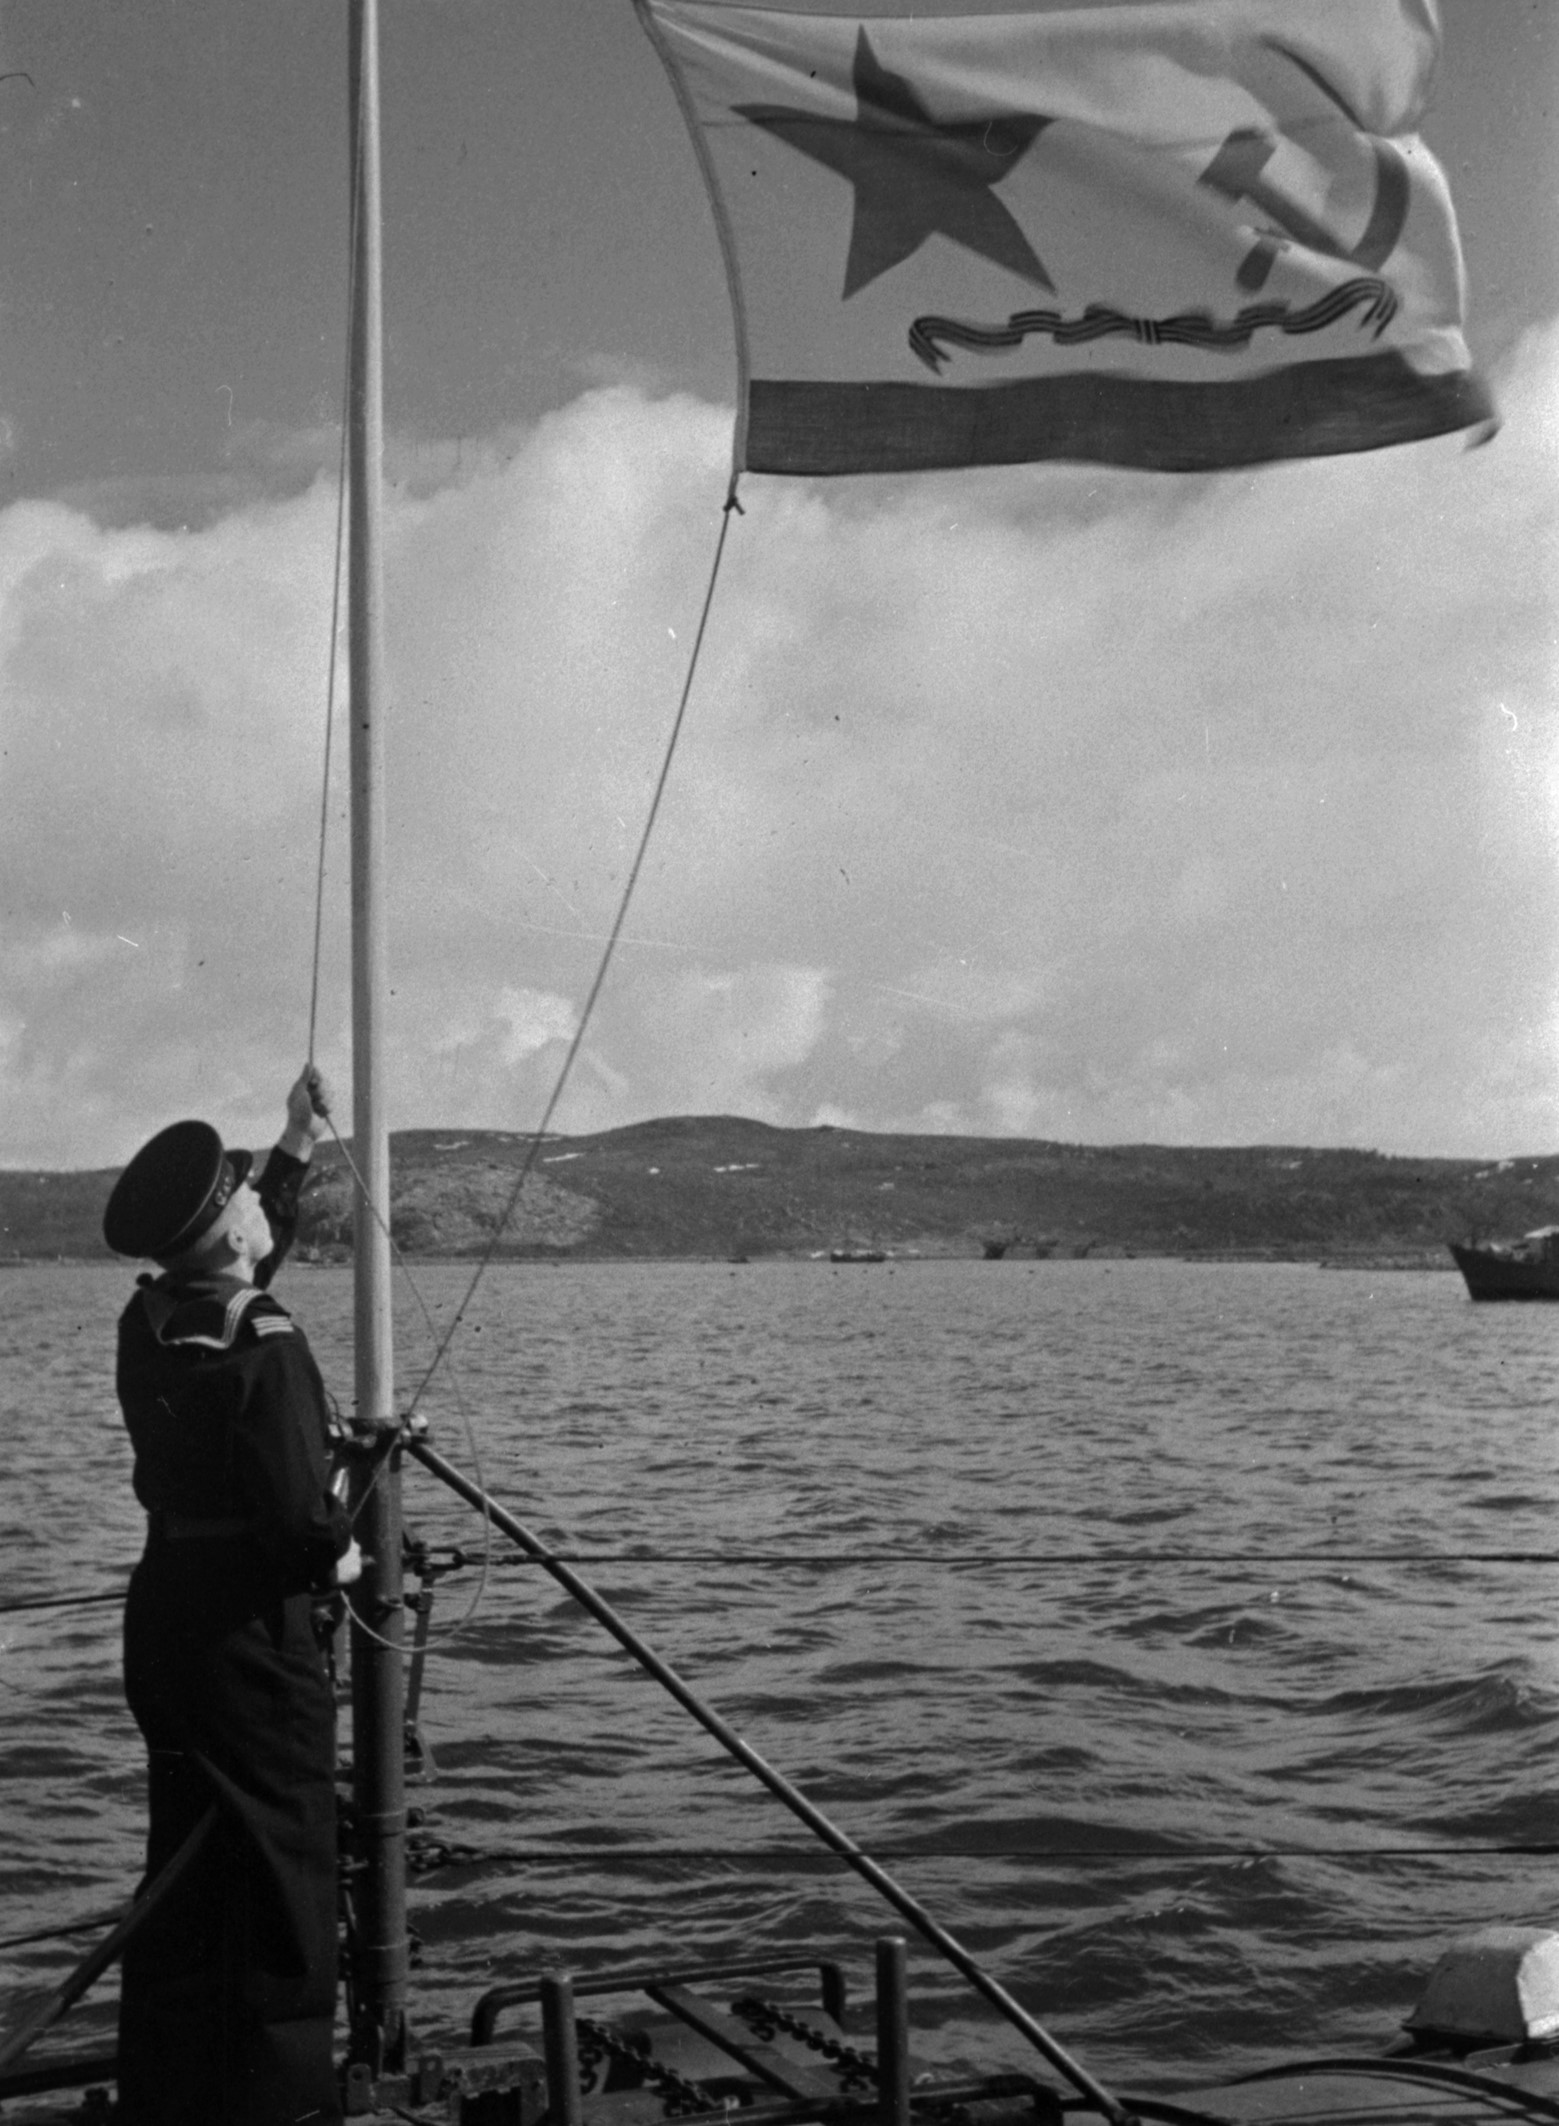 Поднятие гвардейского флага, 1943